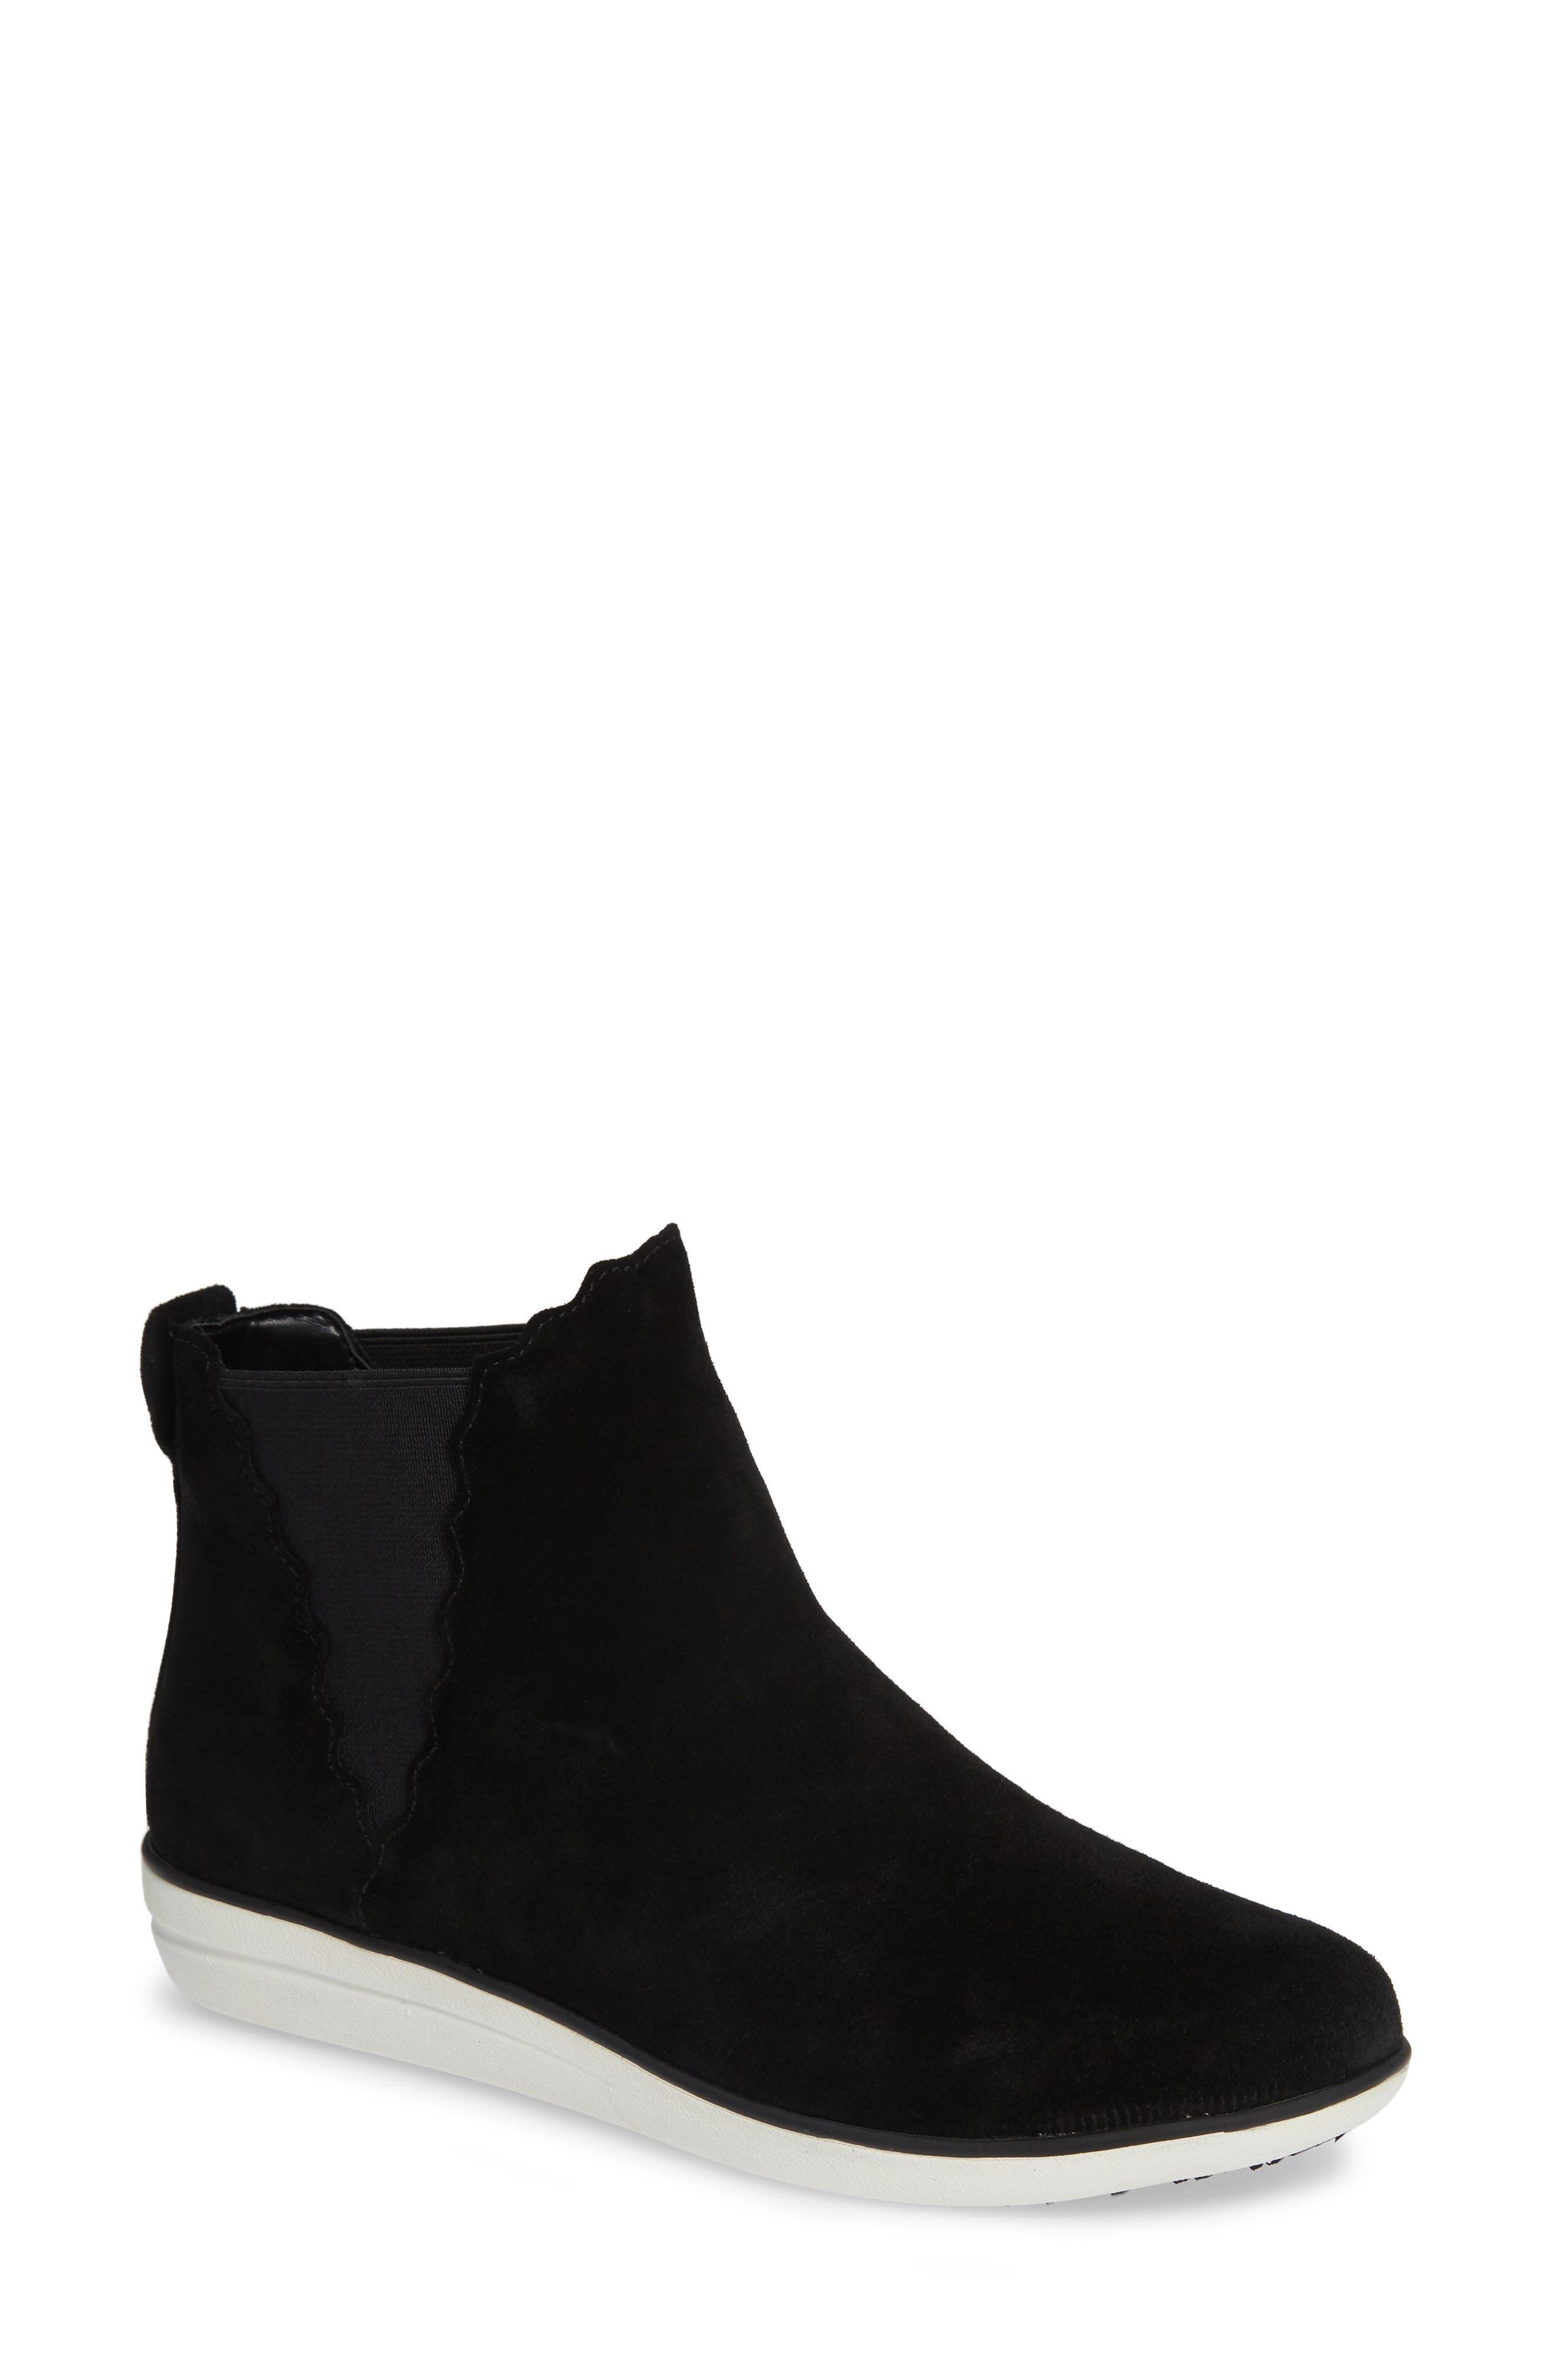 Aetrex Alanna Slip-On High Top Sneaker, Black